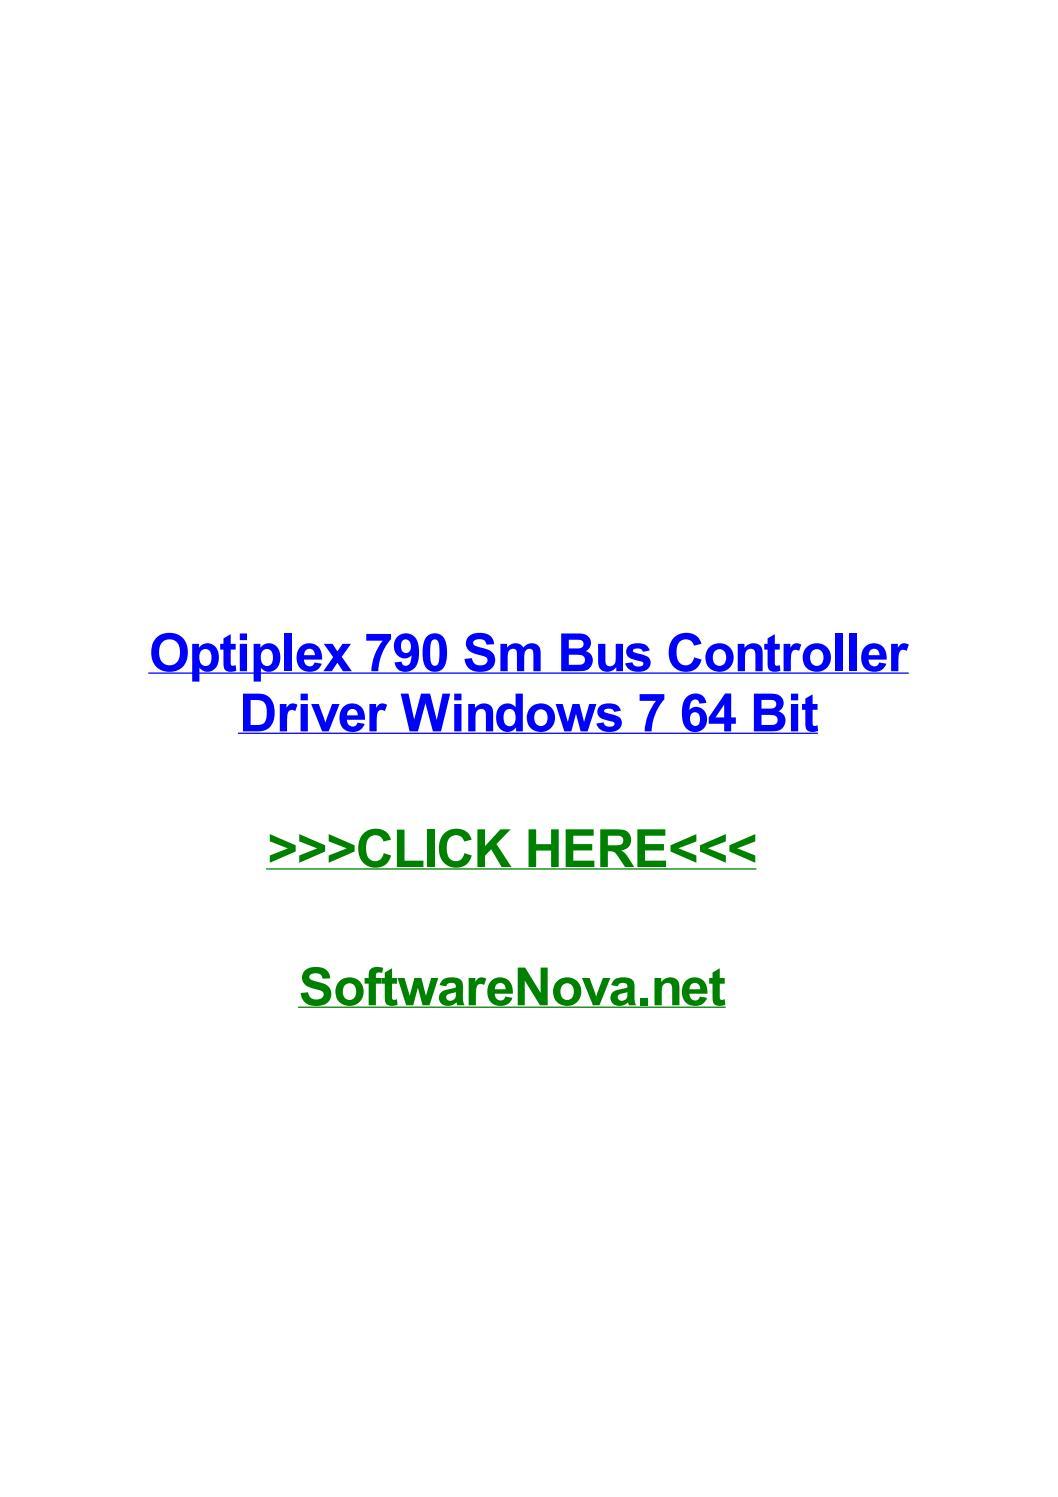 Dell optiplex 790 sm bus controller driver windows 7 64 bit by.